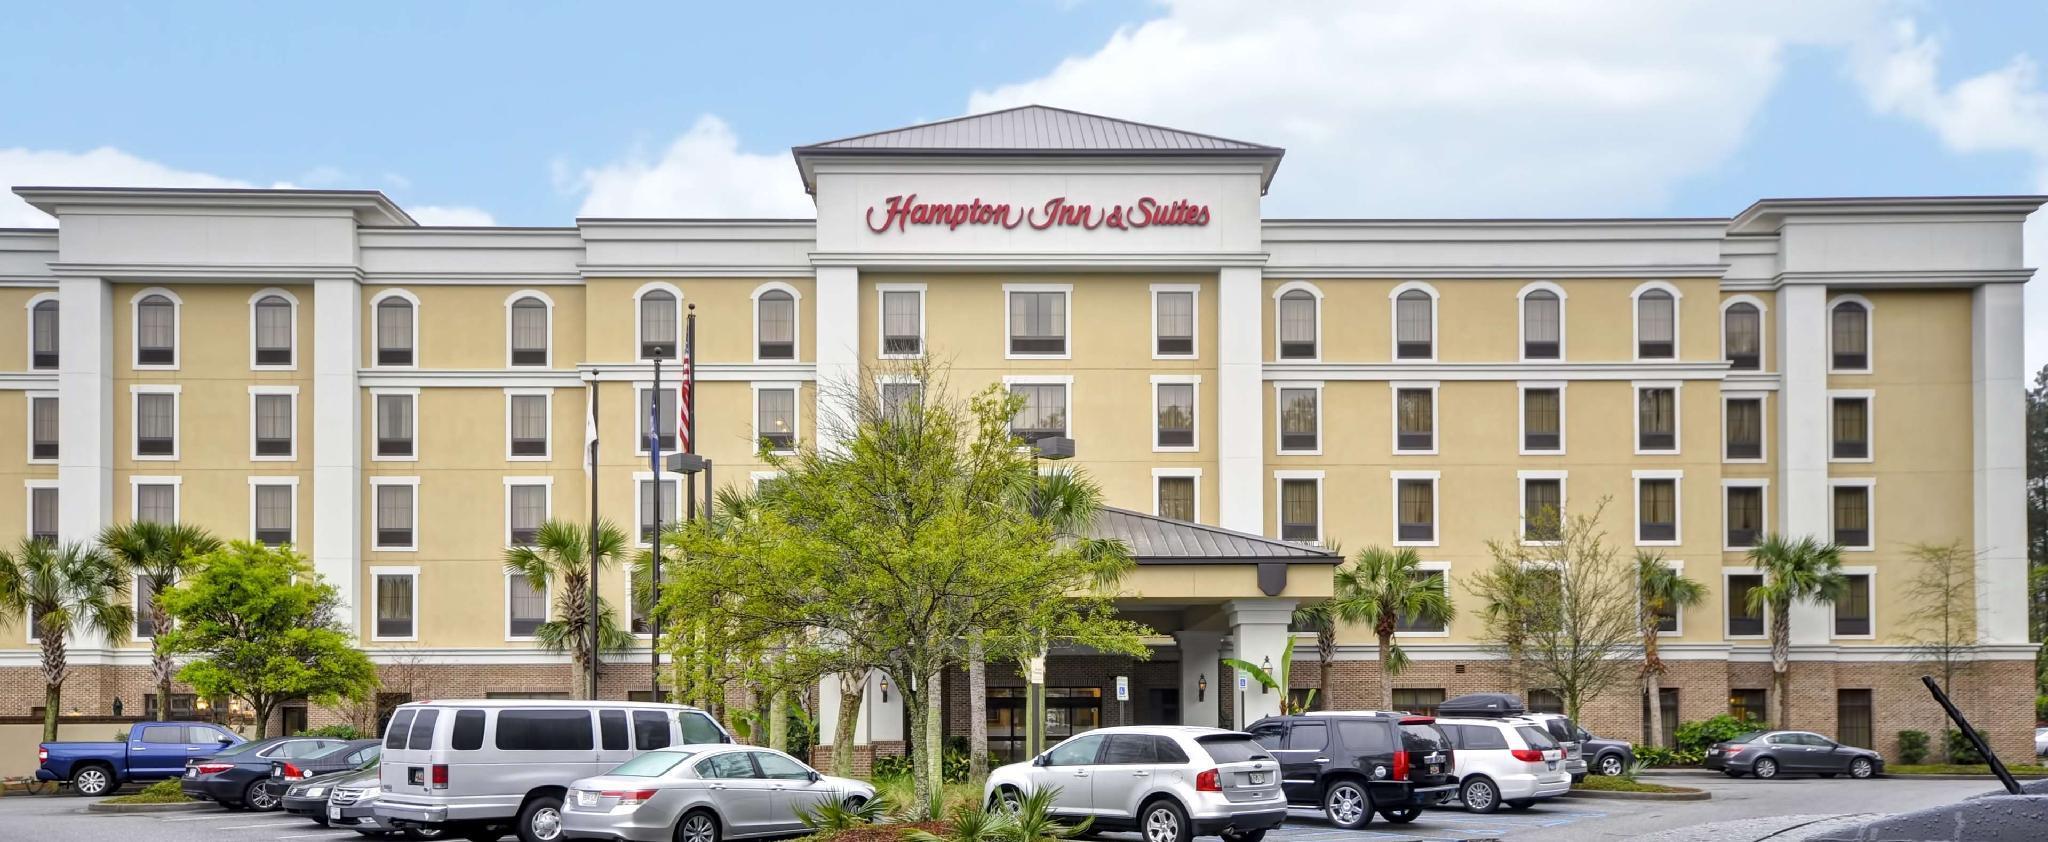 Hampton Inn And Suites North Charleston University Blvd